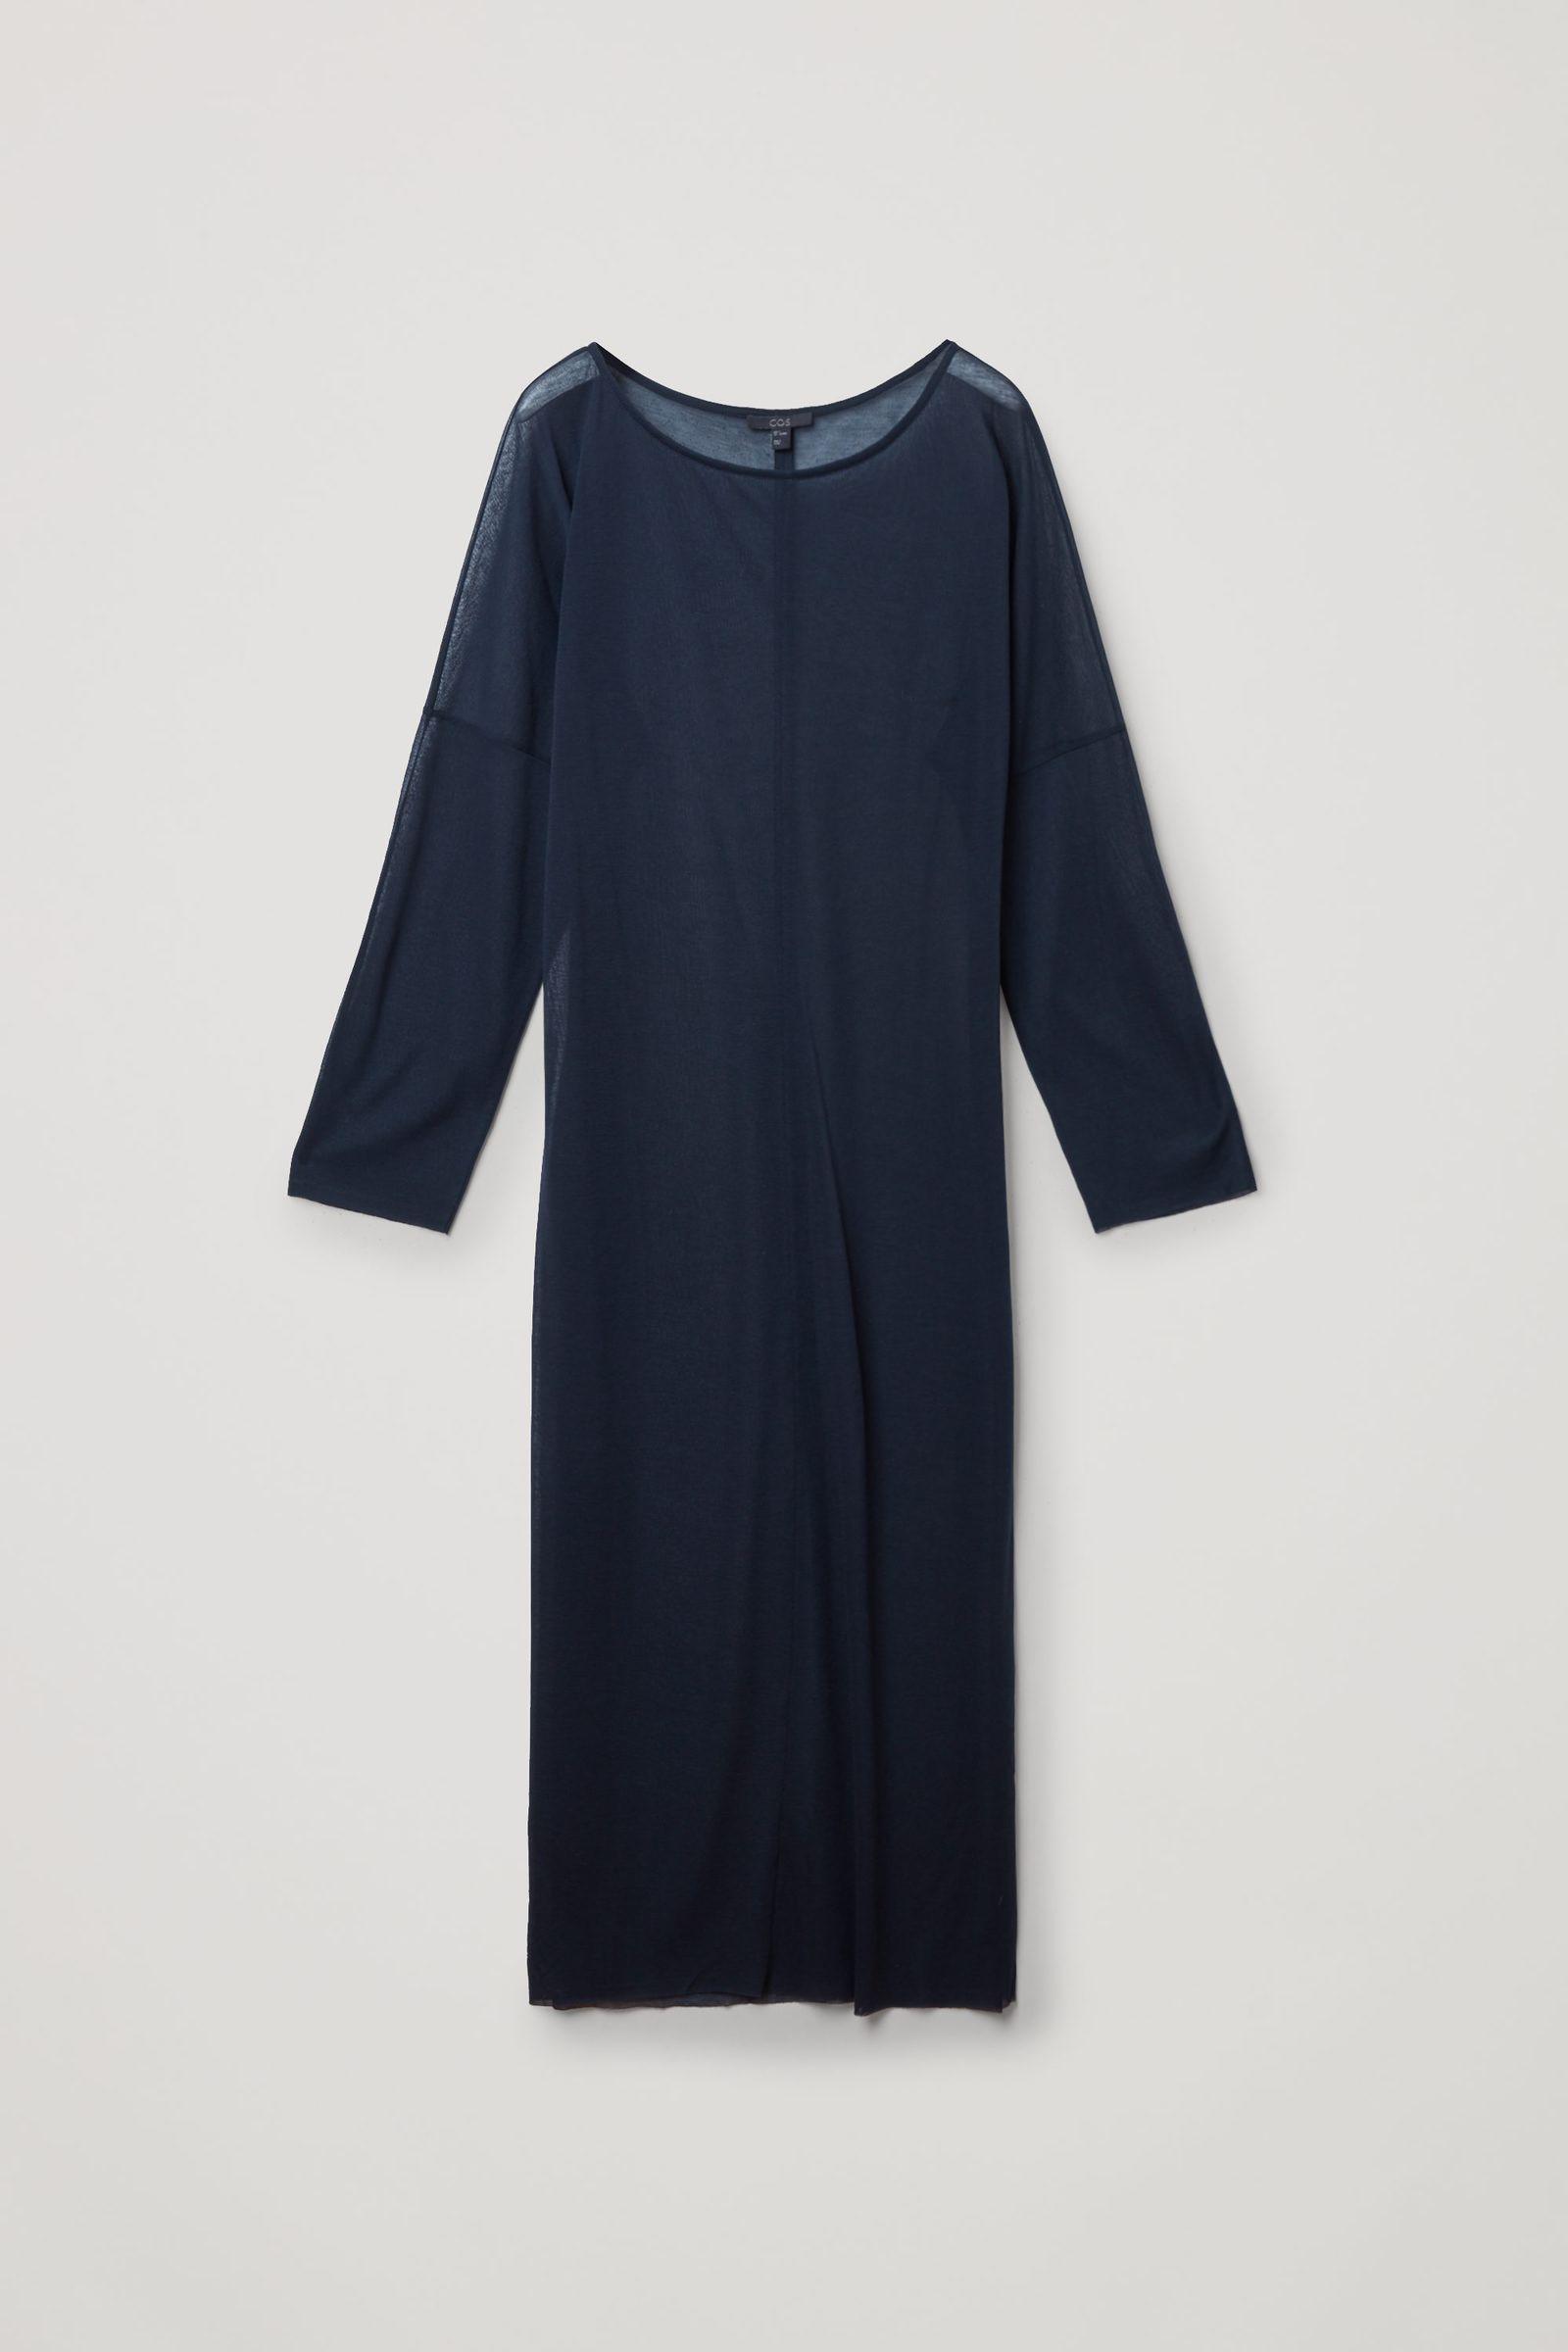 COS 롱 쉬어 코튼 드레스의 네이비컬러 Product입니다.